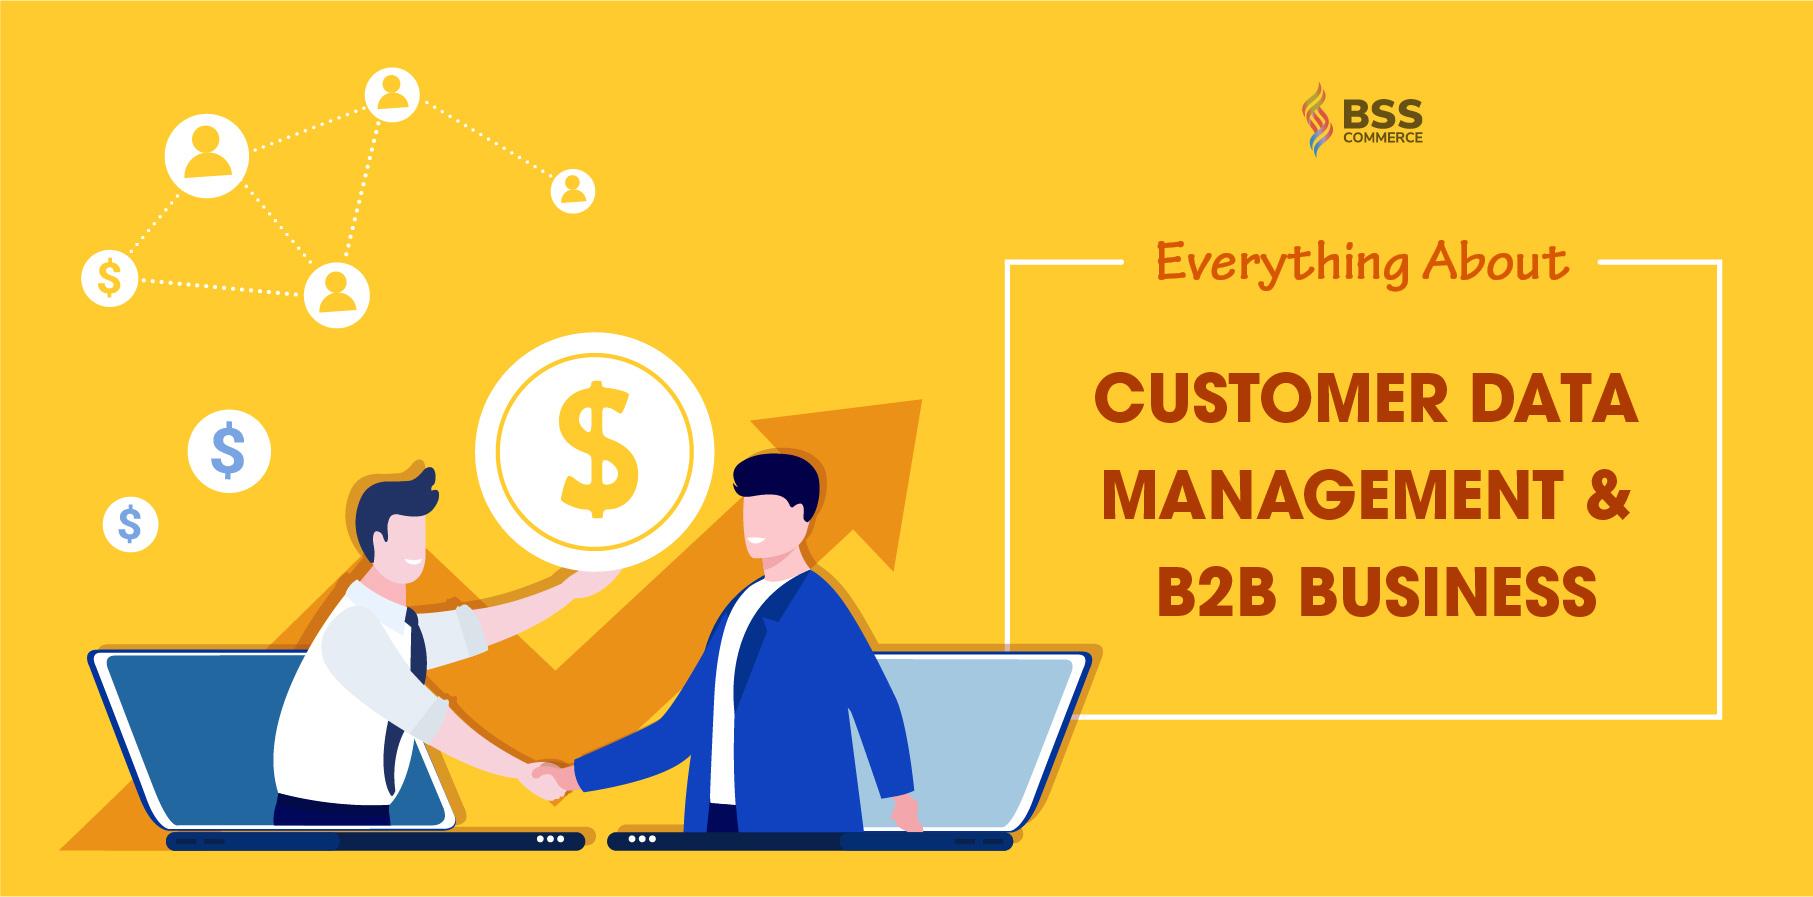 customer-data-management-featured-image